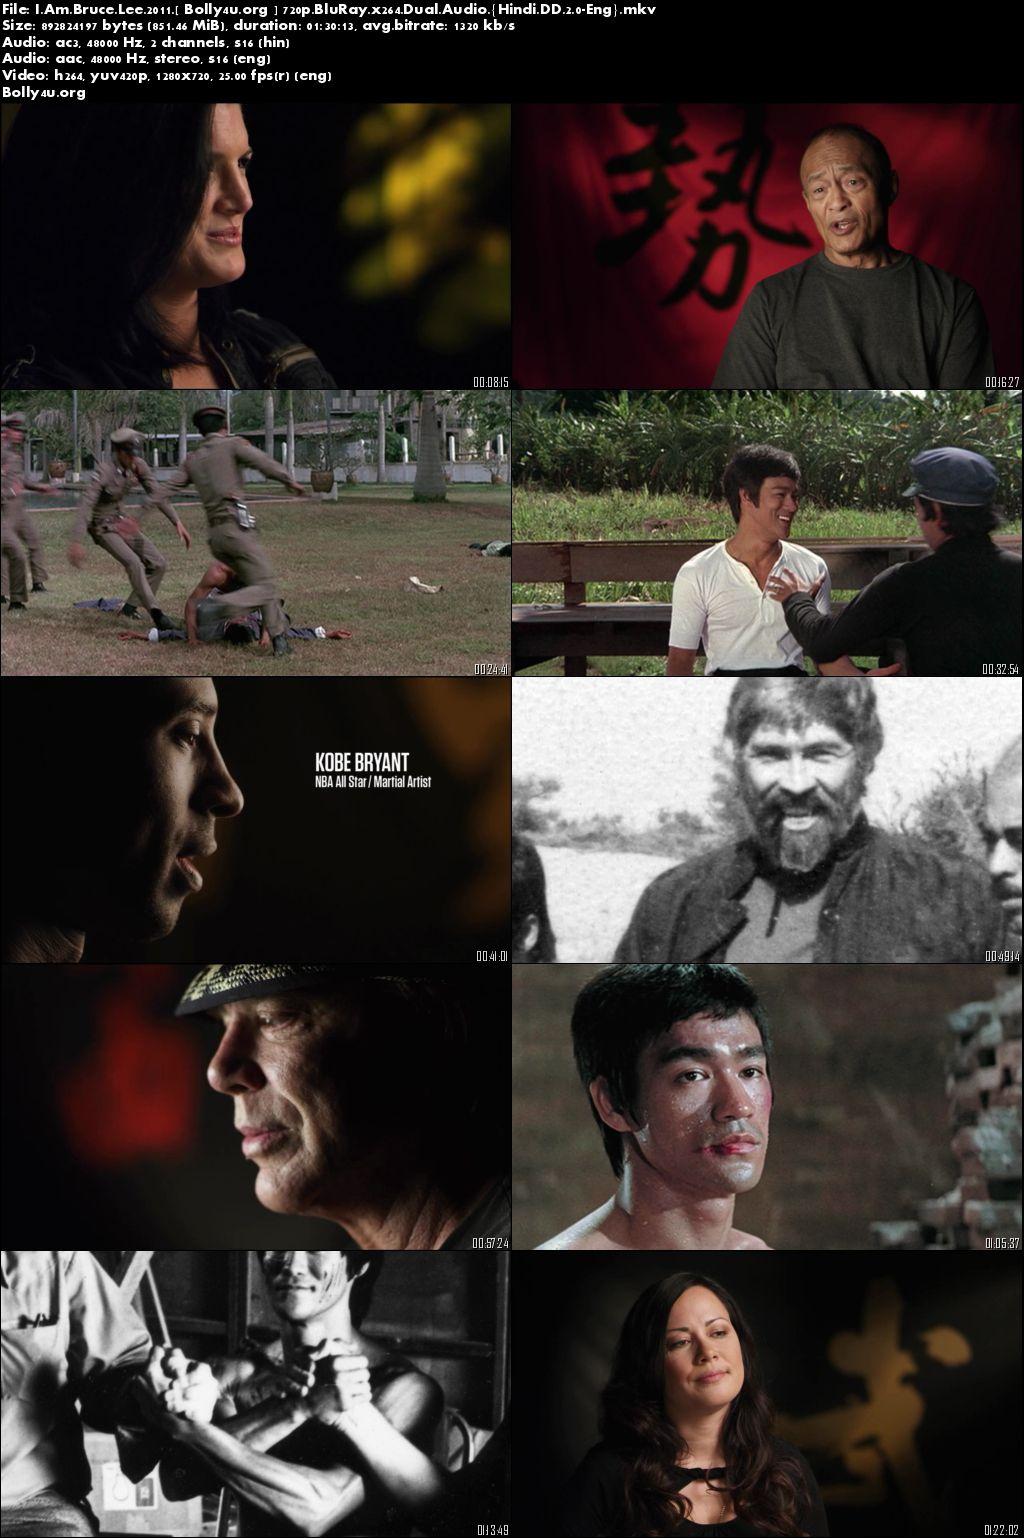 I Am Bruce Lee 2011 BRRip 300MB Hindi Dual Audio 480p Download